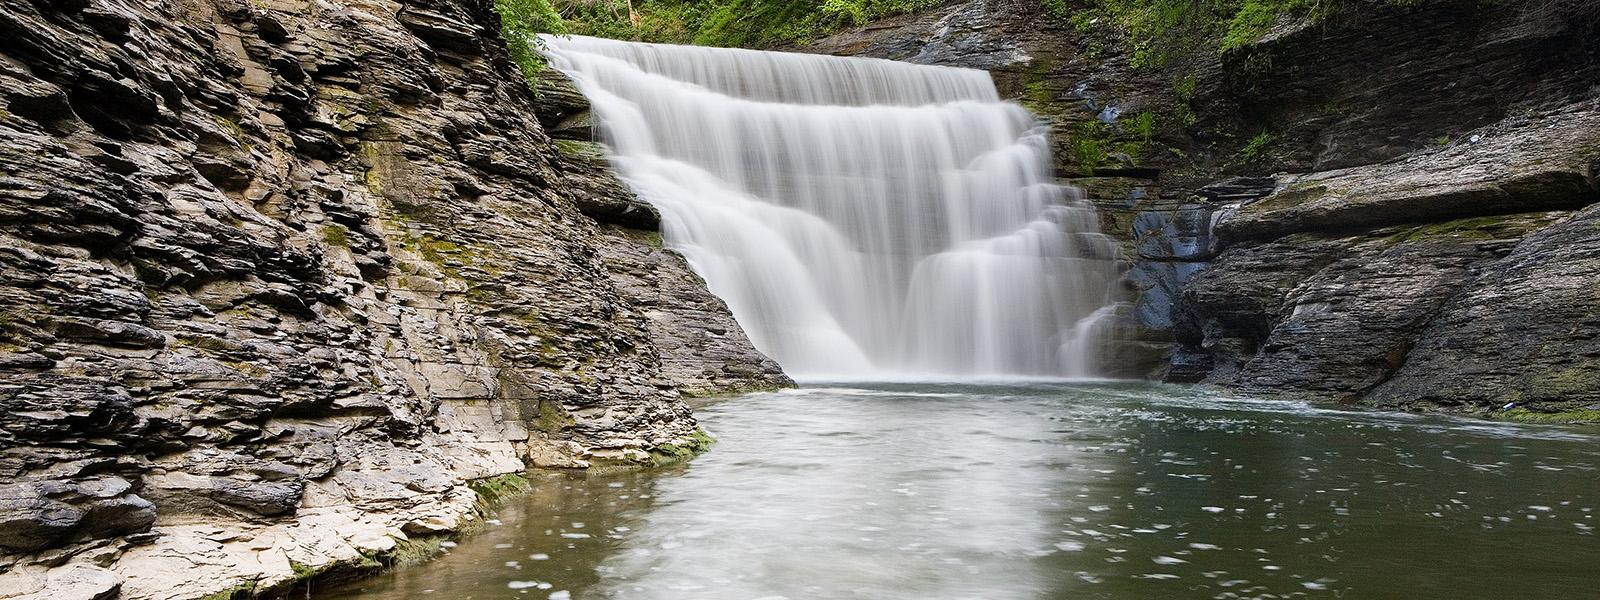 Canajoharie Falls